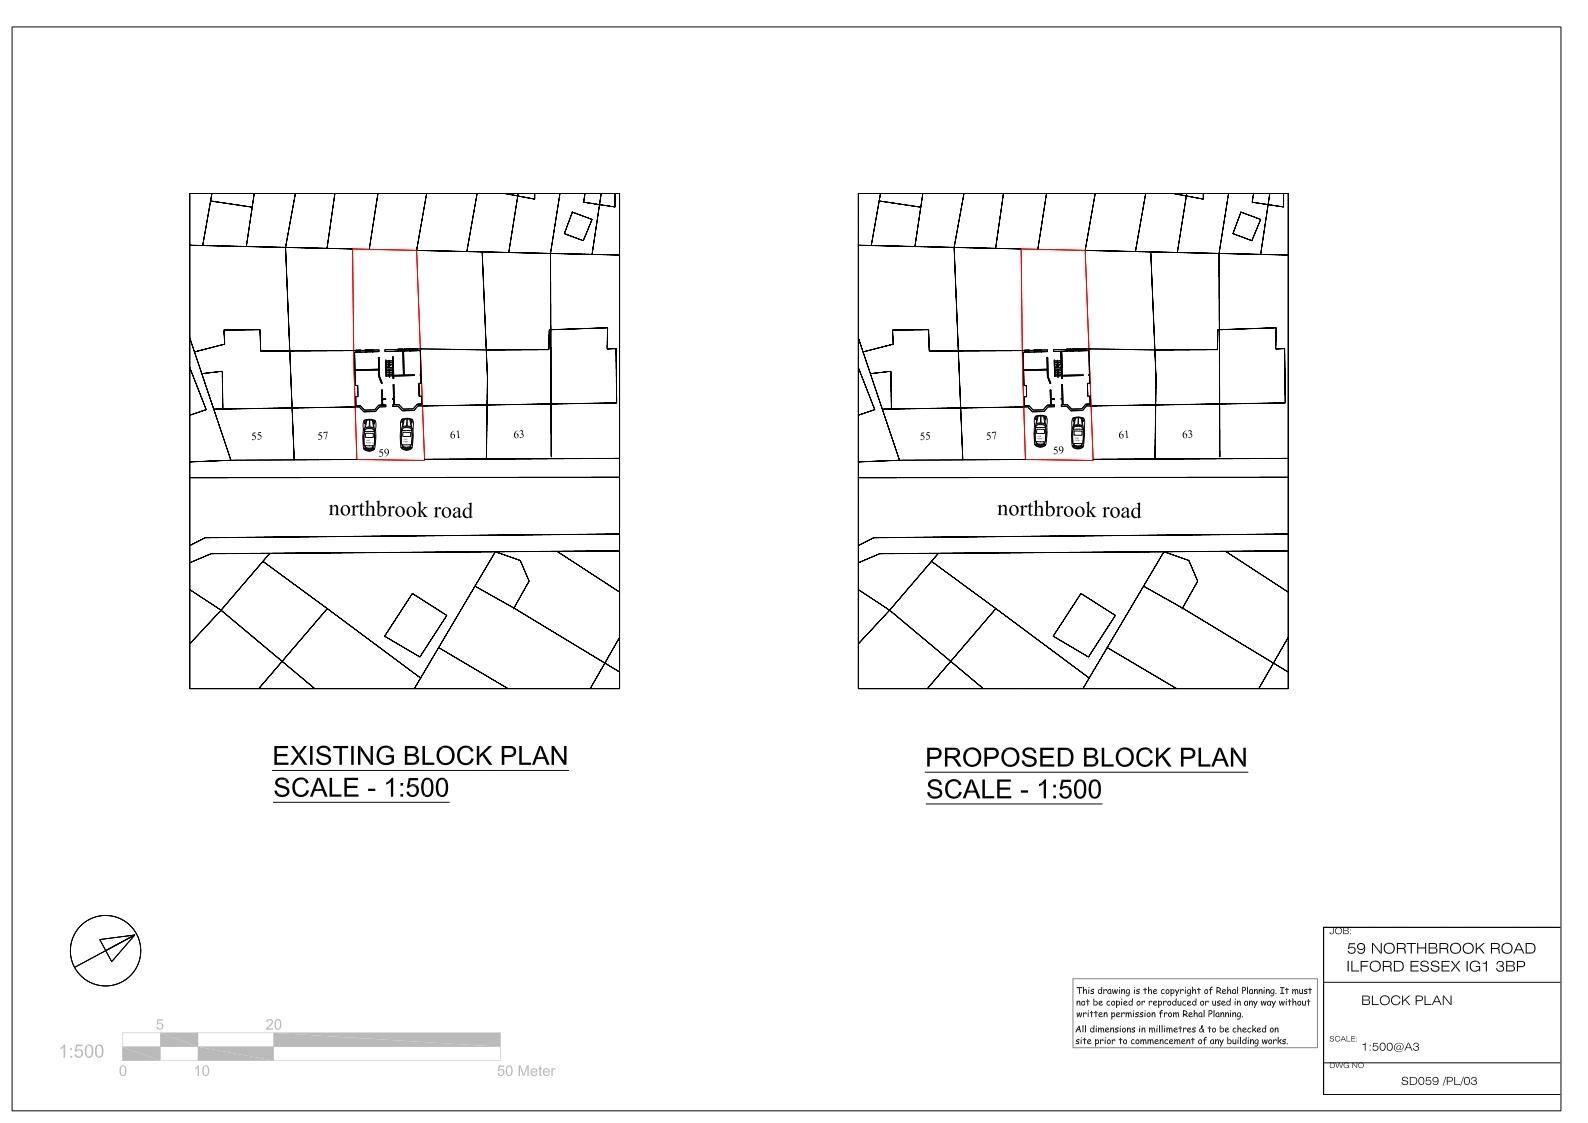 block-plan-59northbrook_rd